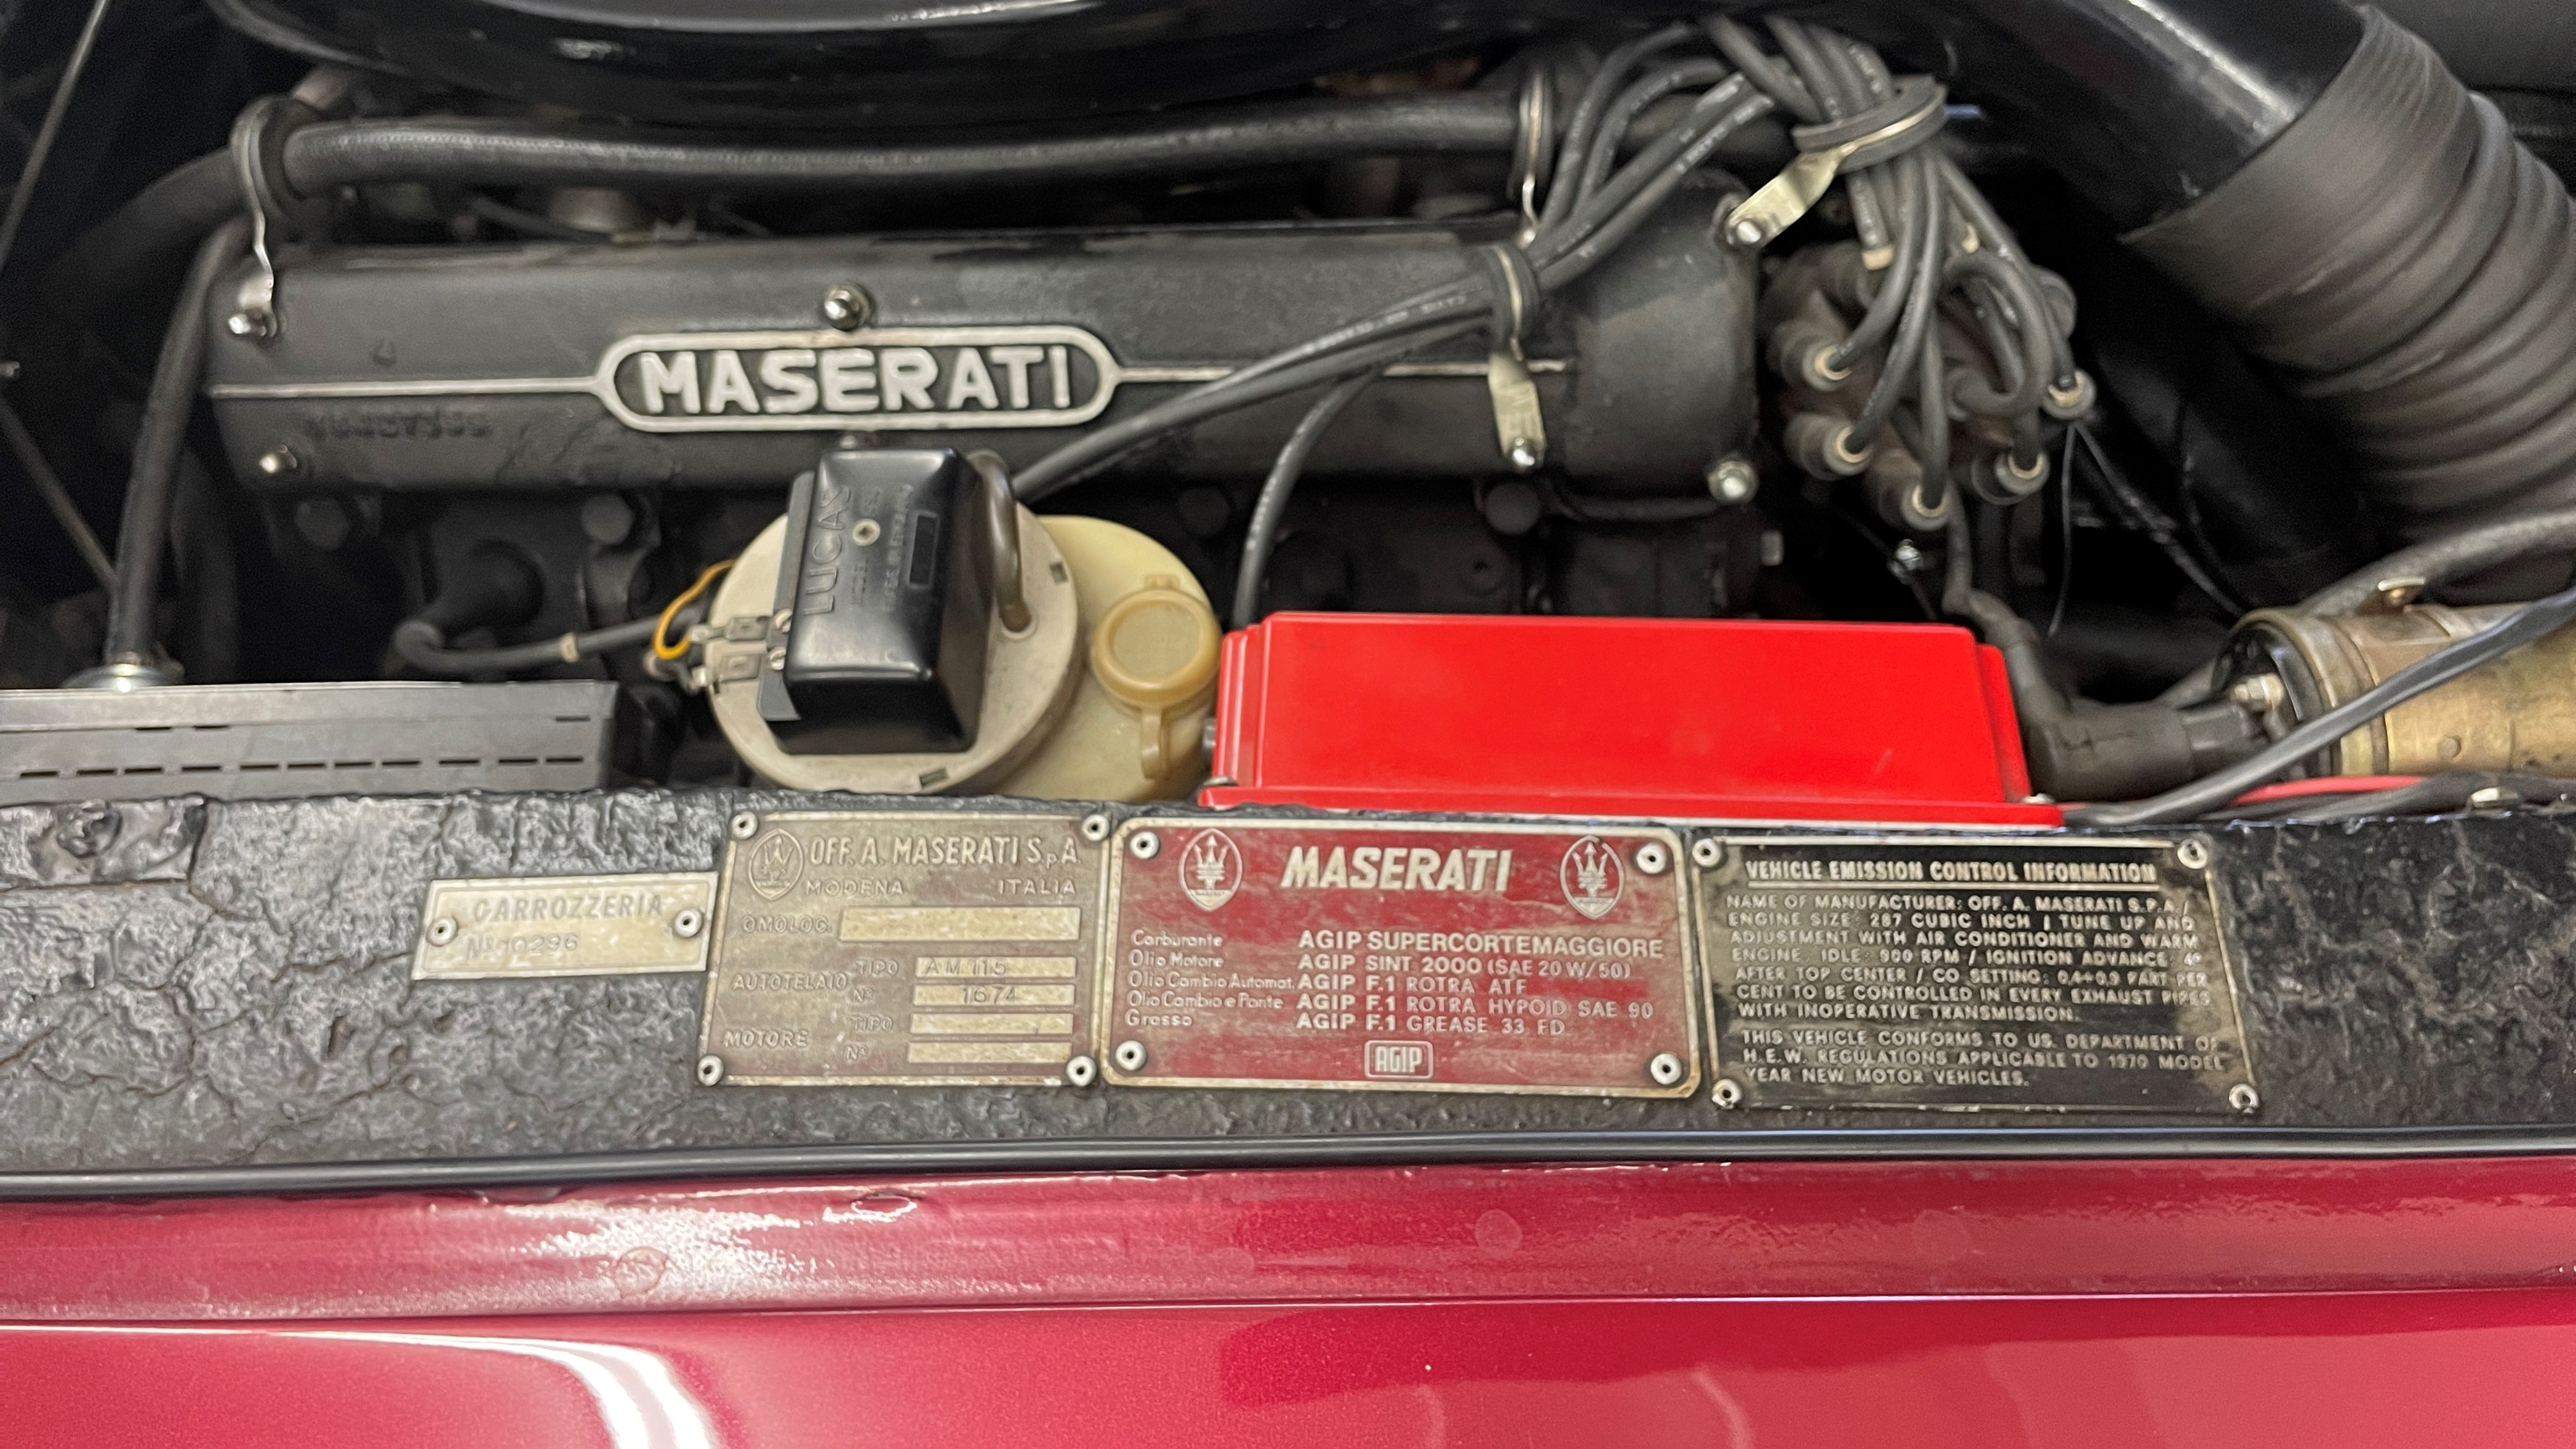 Maserati engine bay